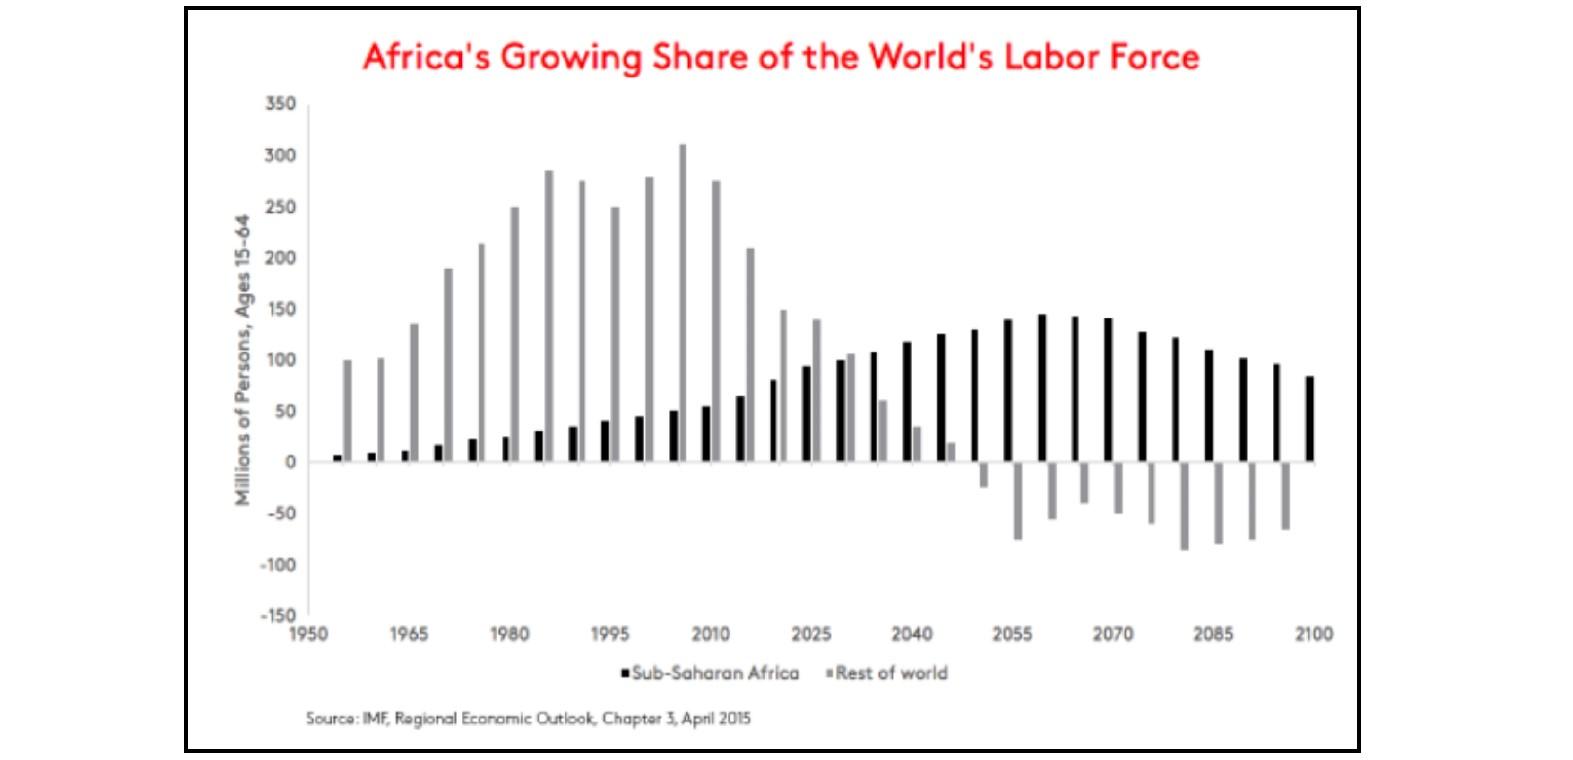 Fairfax Africa Holdings